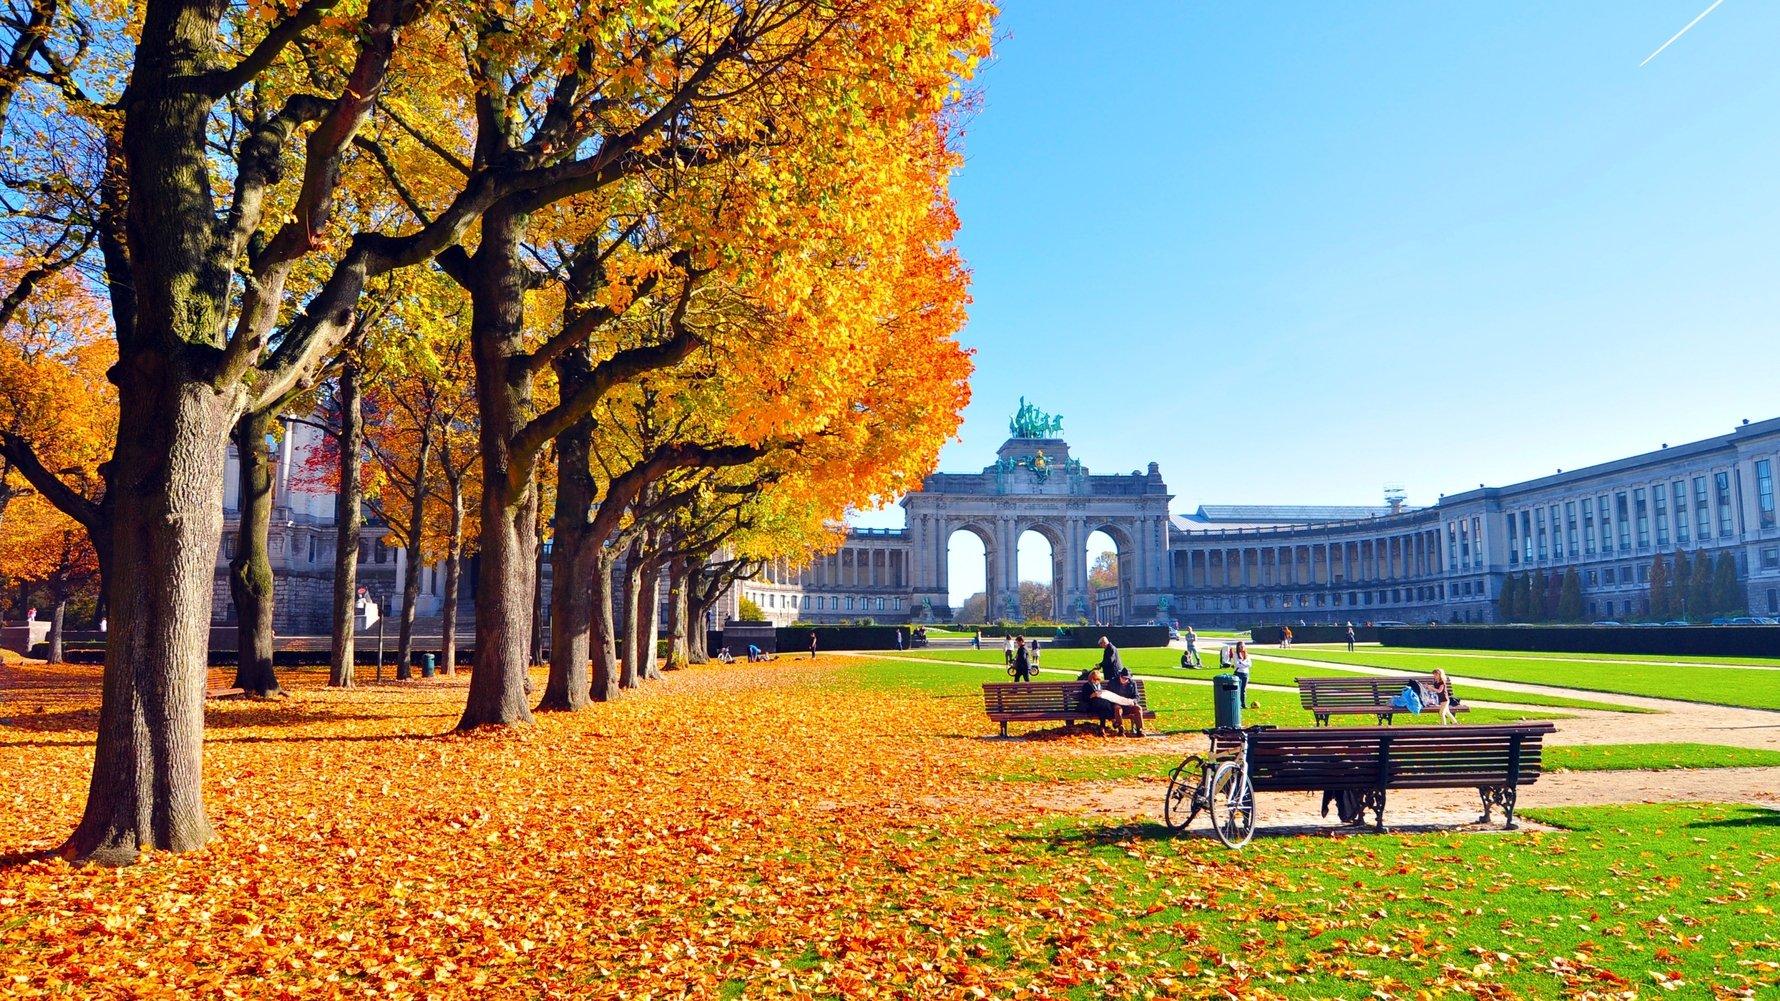 © Eduard Wichner Shutterstock.com autumn scenery in park golden trees